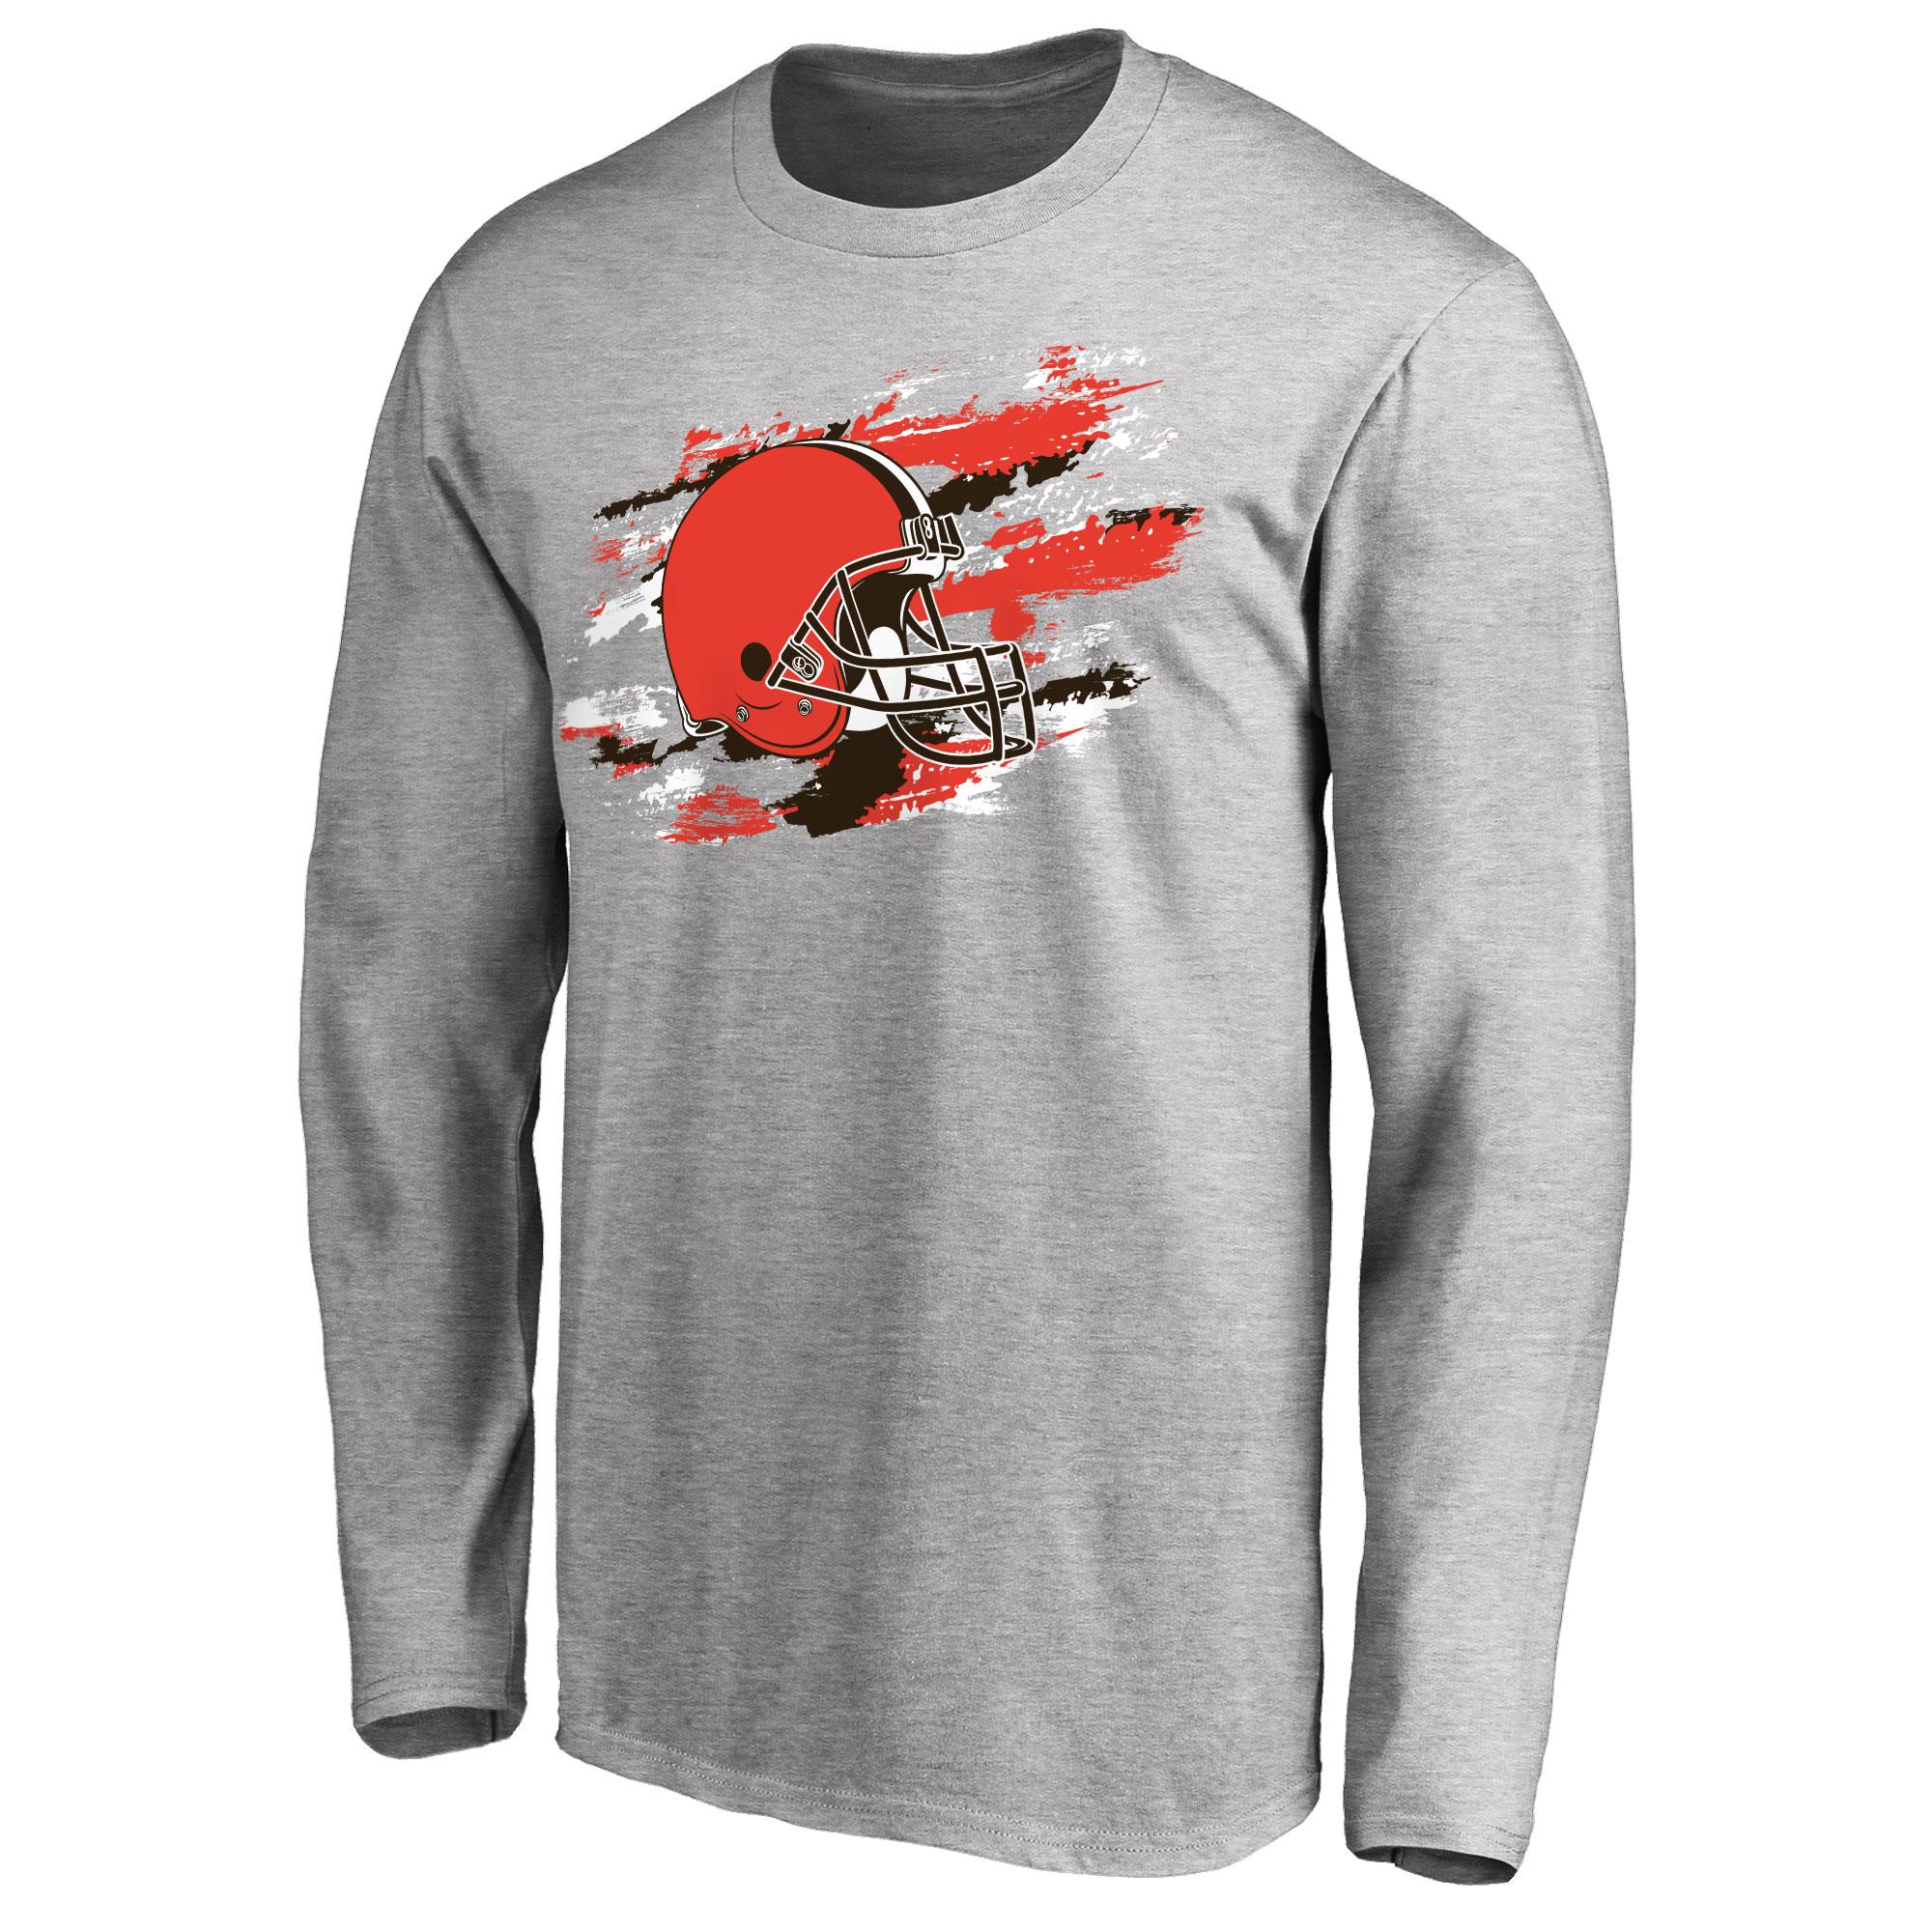 Cleveland Browns NFL Pro Line True Colors Long Sleeve T-Shirt - Ash